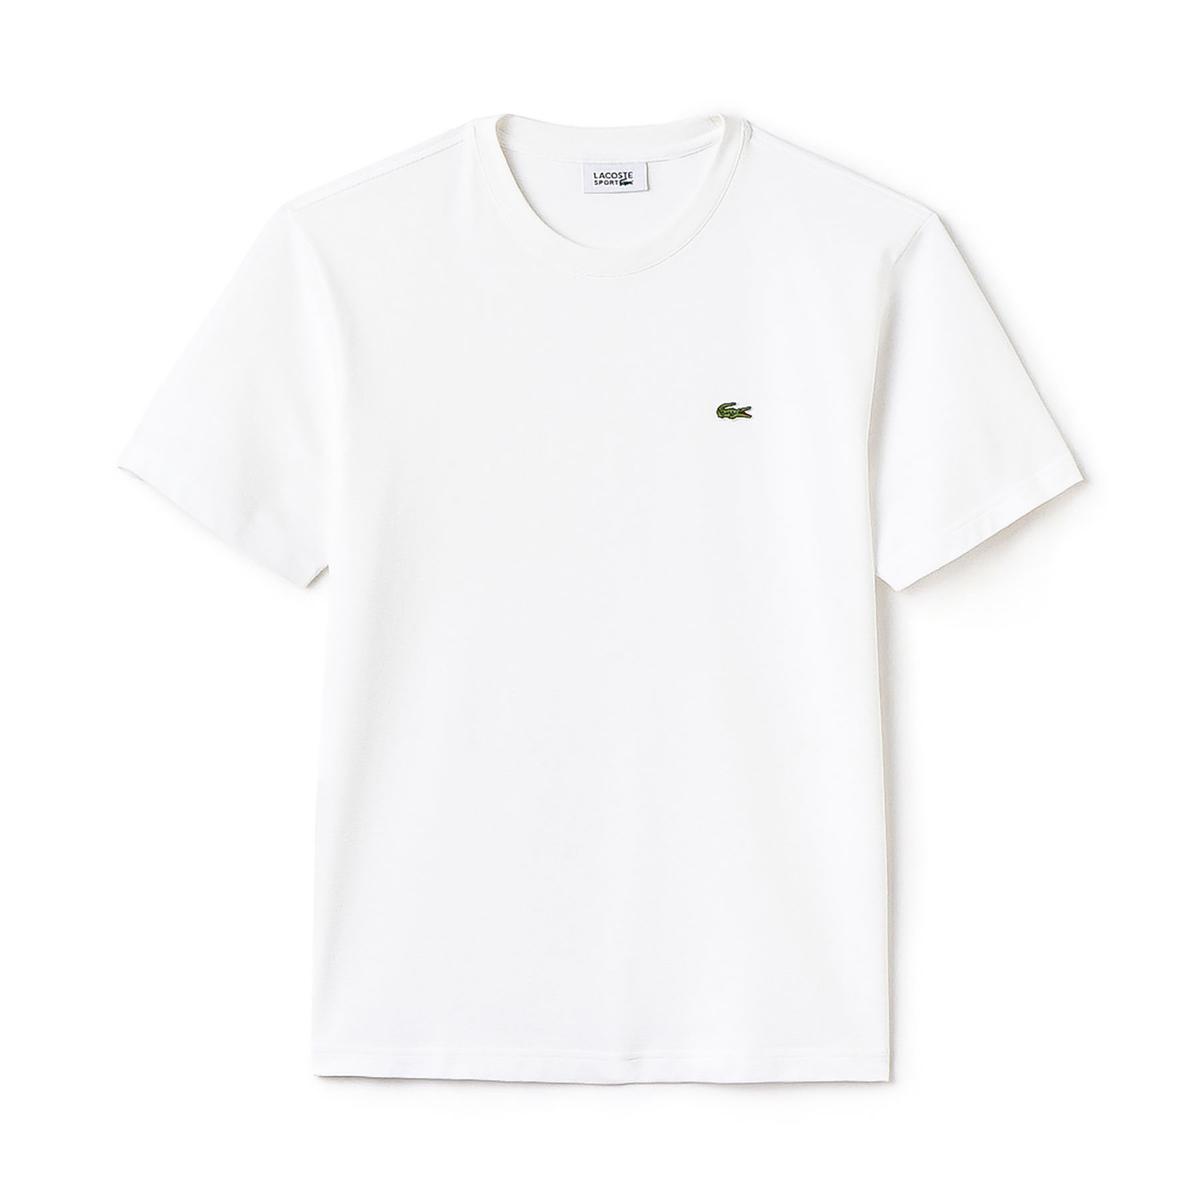 T-shirt in piqu�